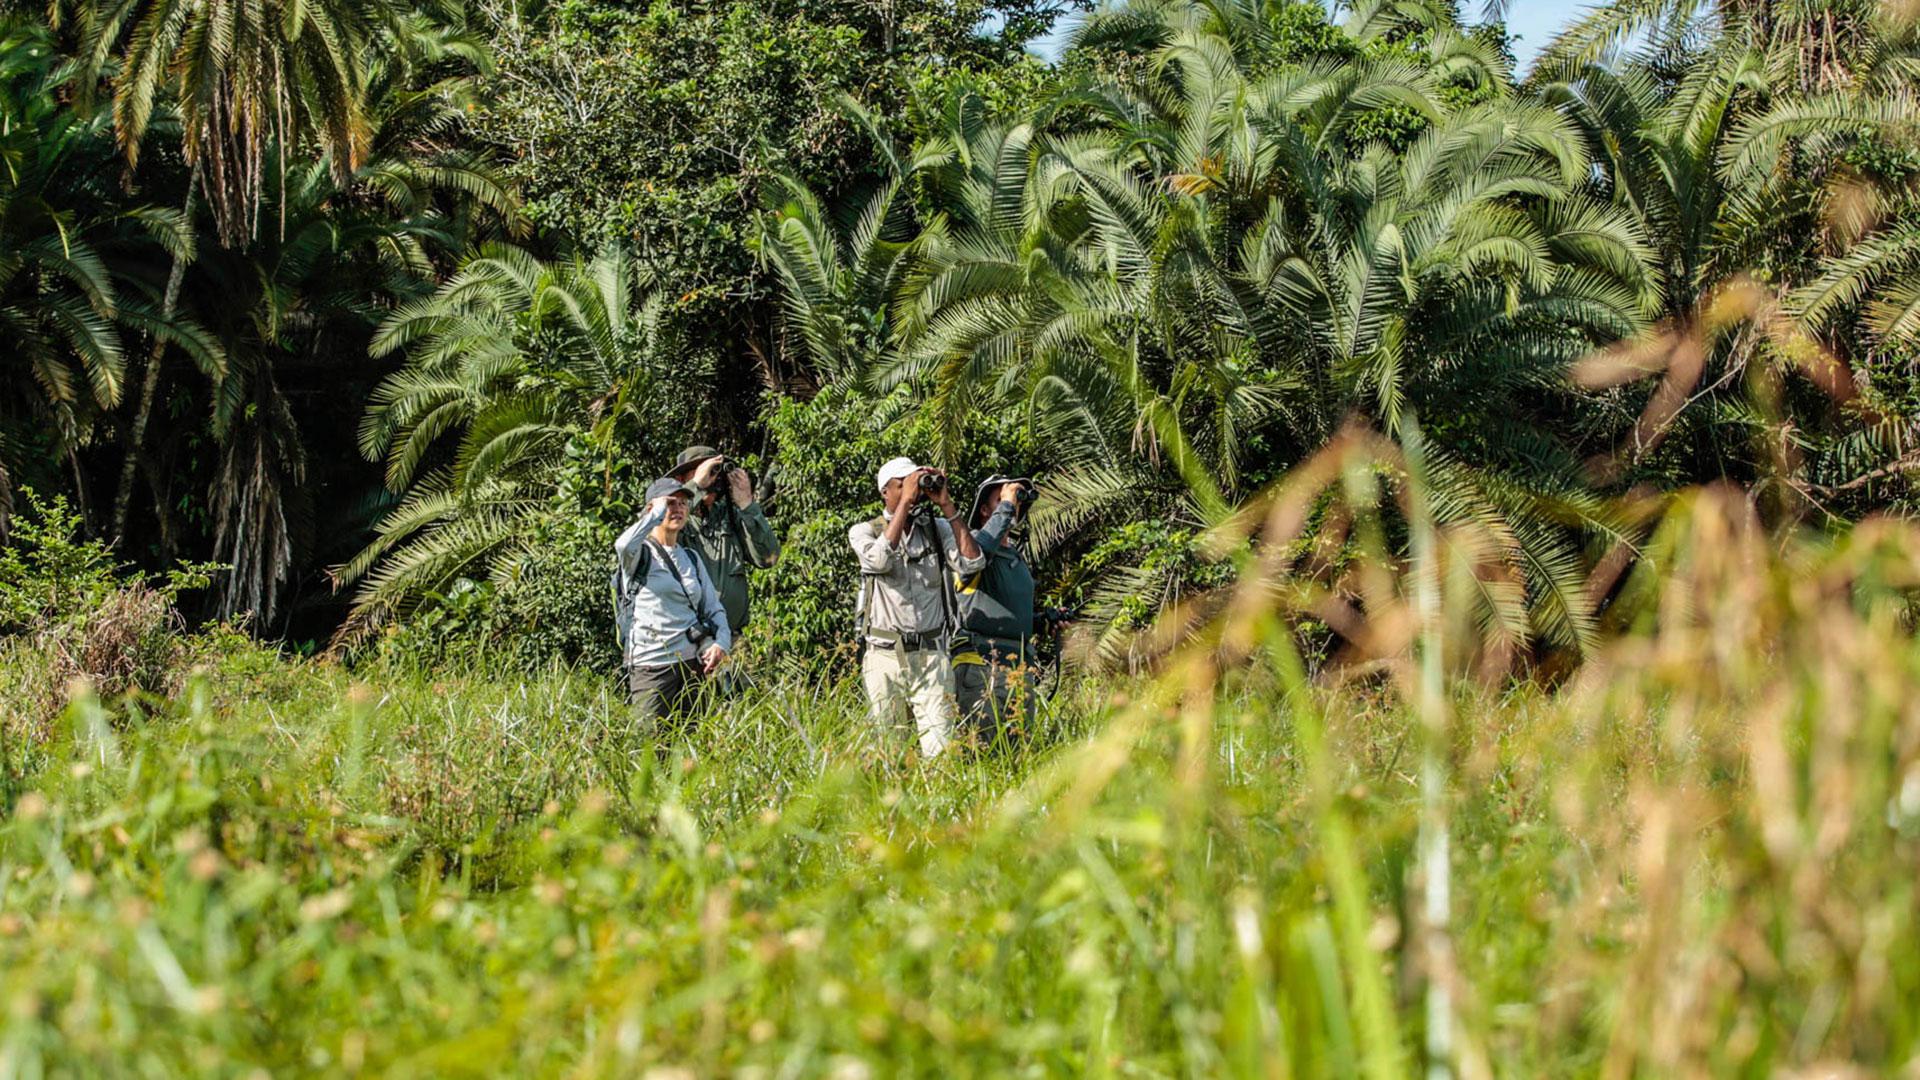 Safari-goers walking in the Congo Basin, Republic of Congo